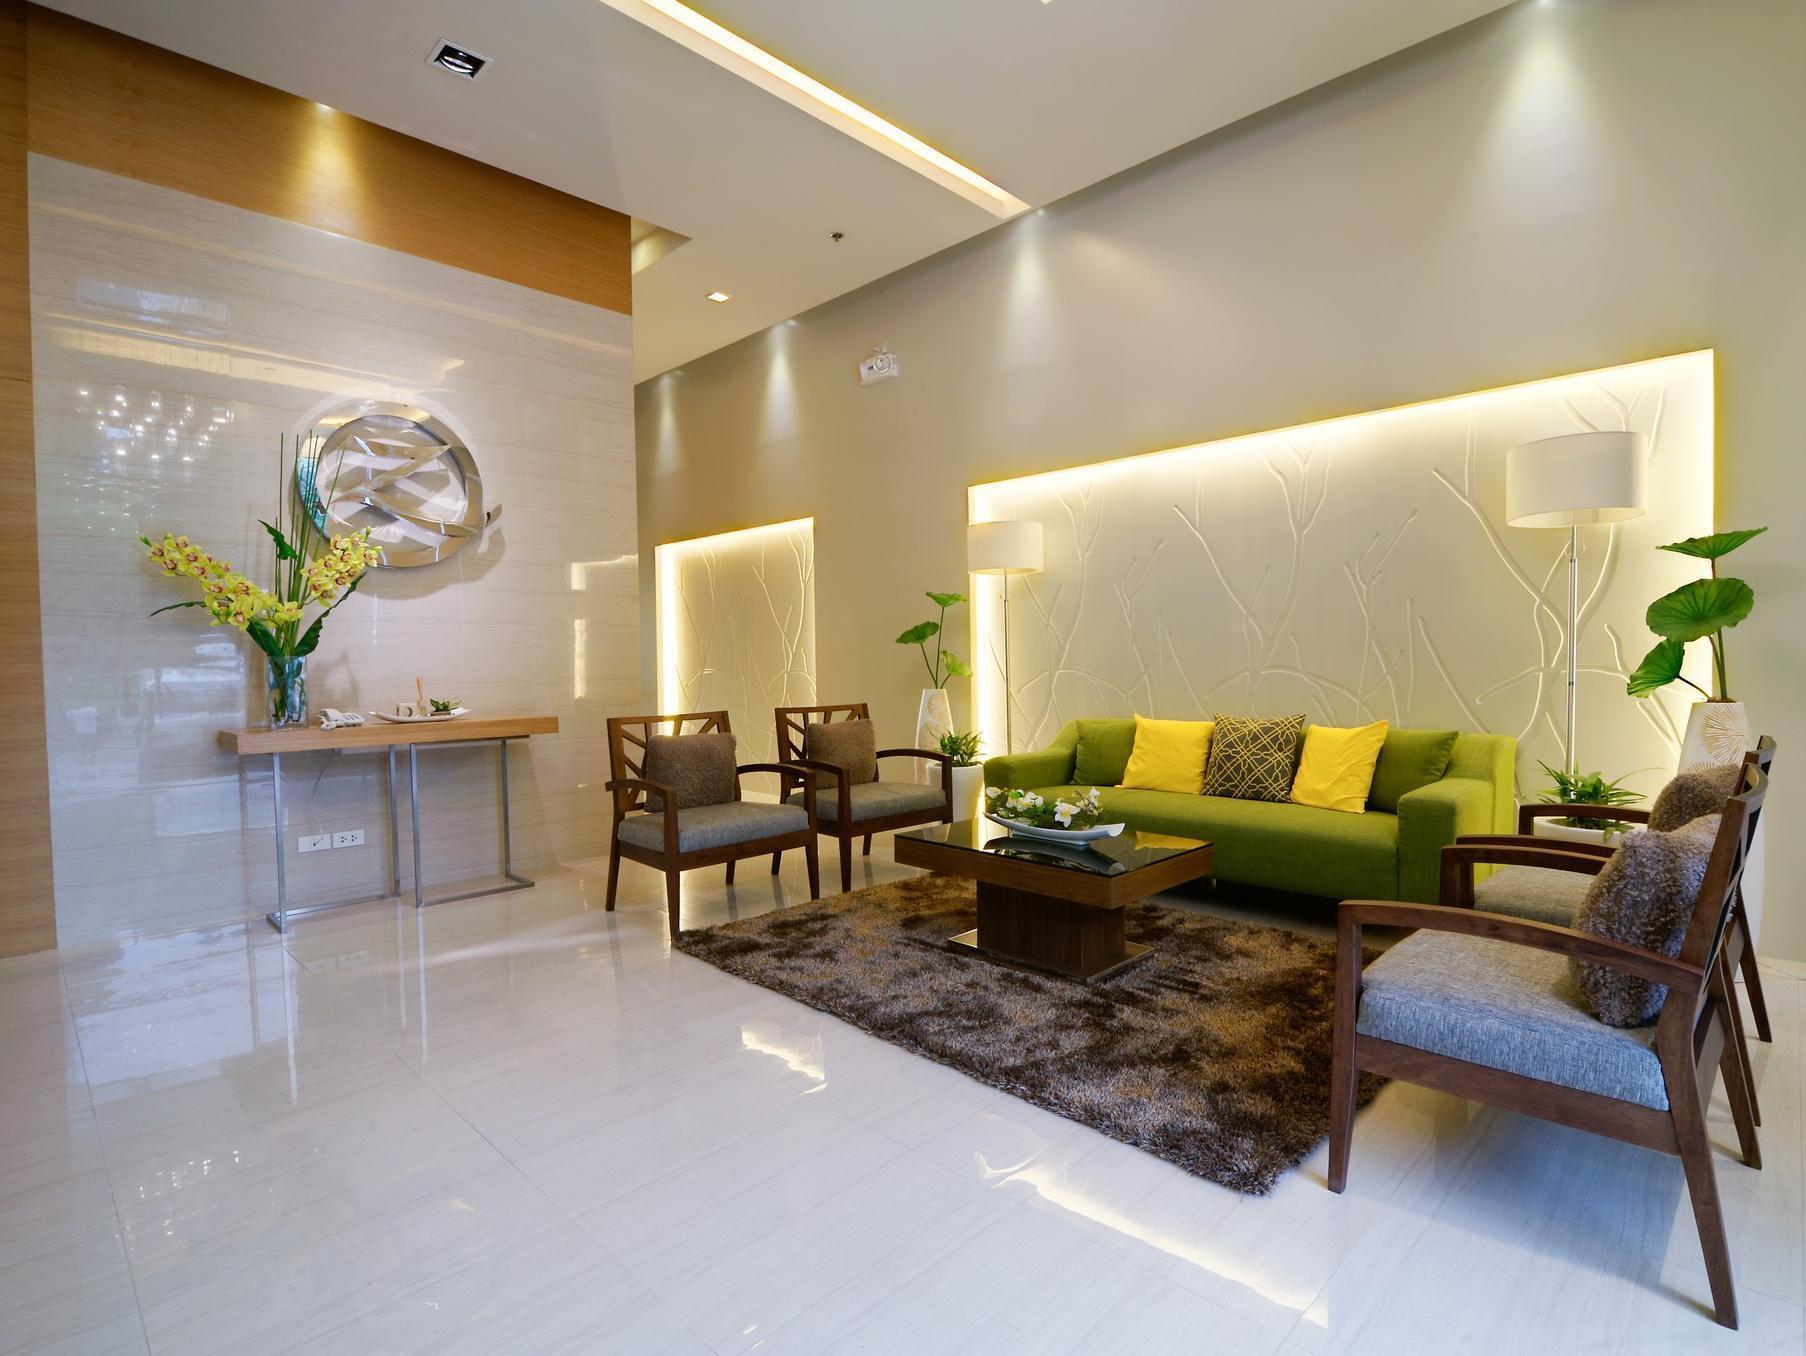 Zerenity Hotel And Suites